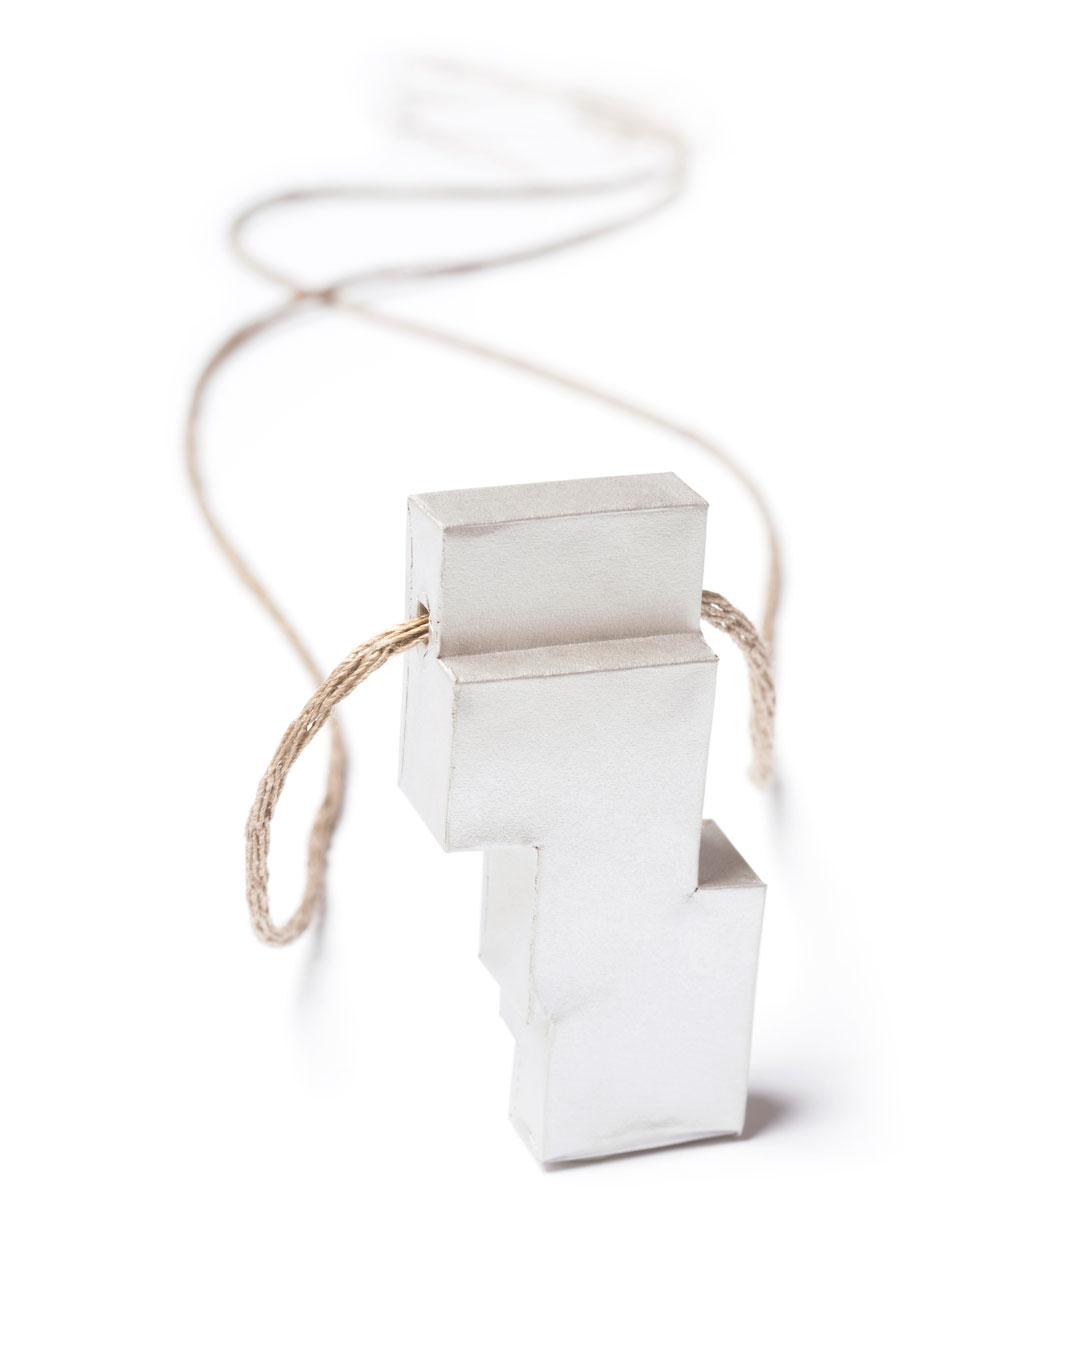 Carla Nuis, Unfurl 10, 2018, pendant; fine silver, linen, 57 x 29 x 12 mm, €710